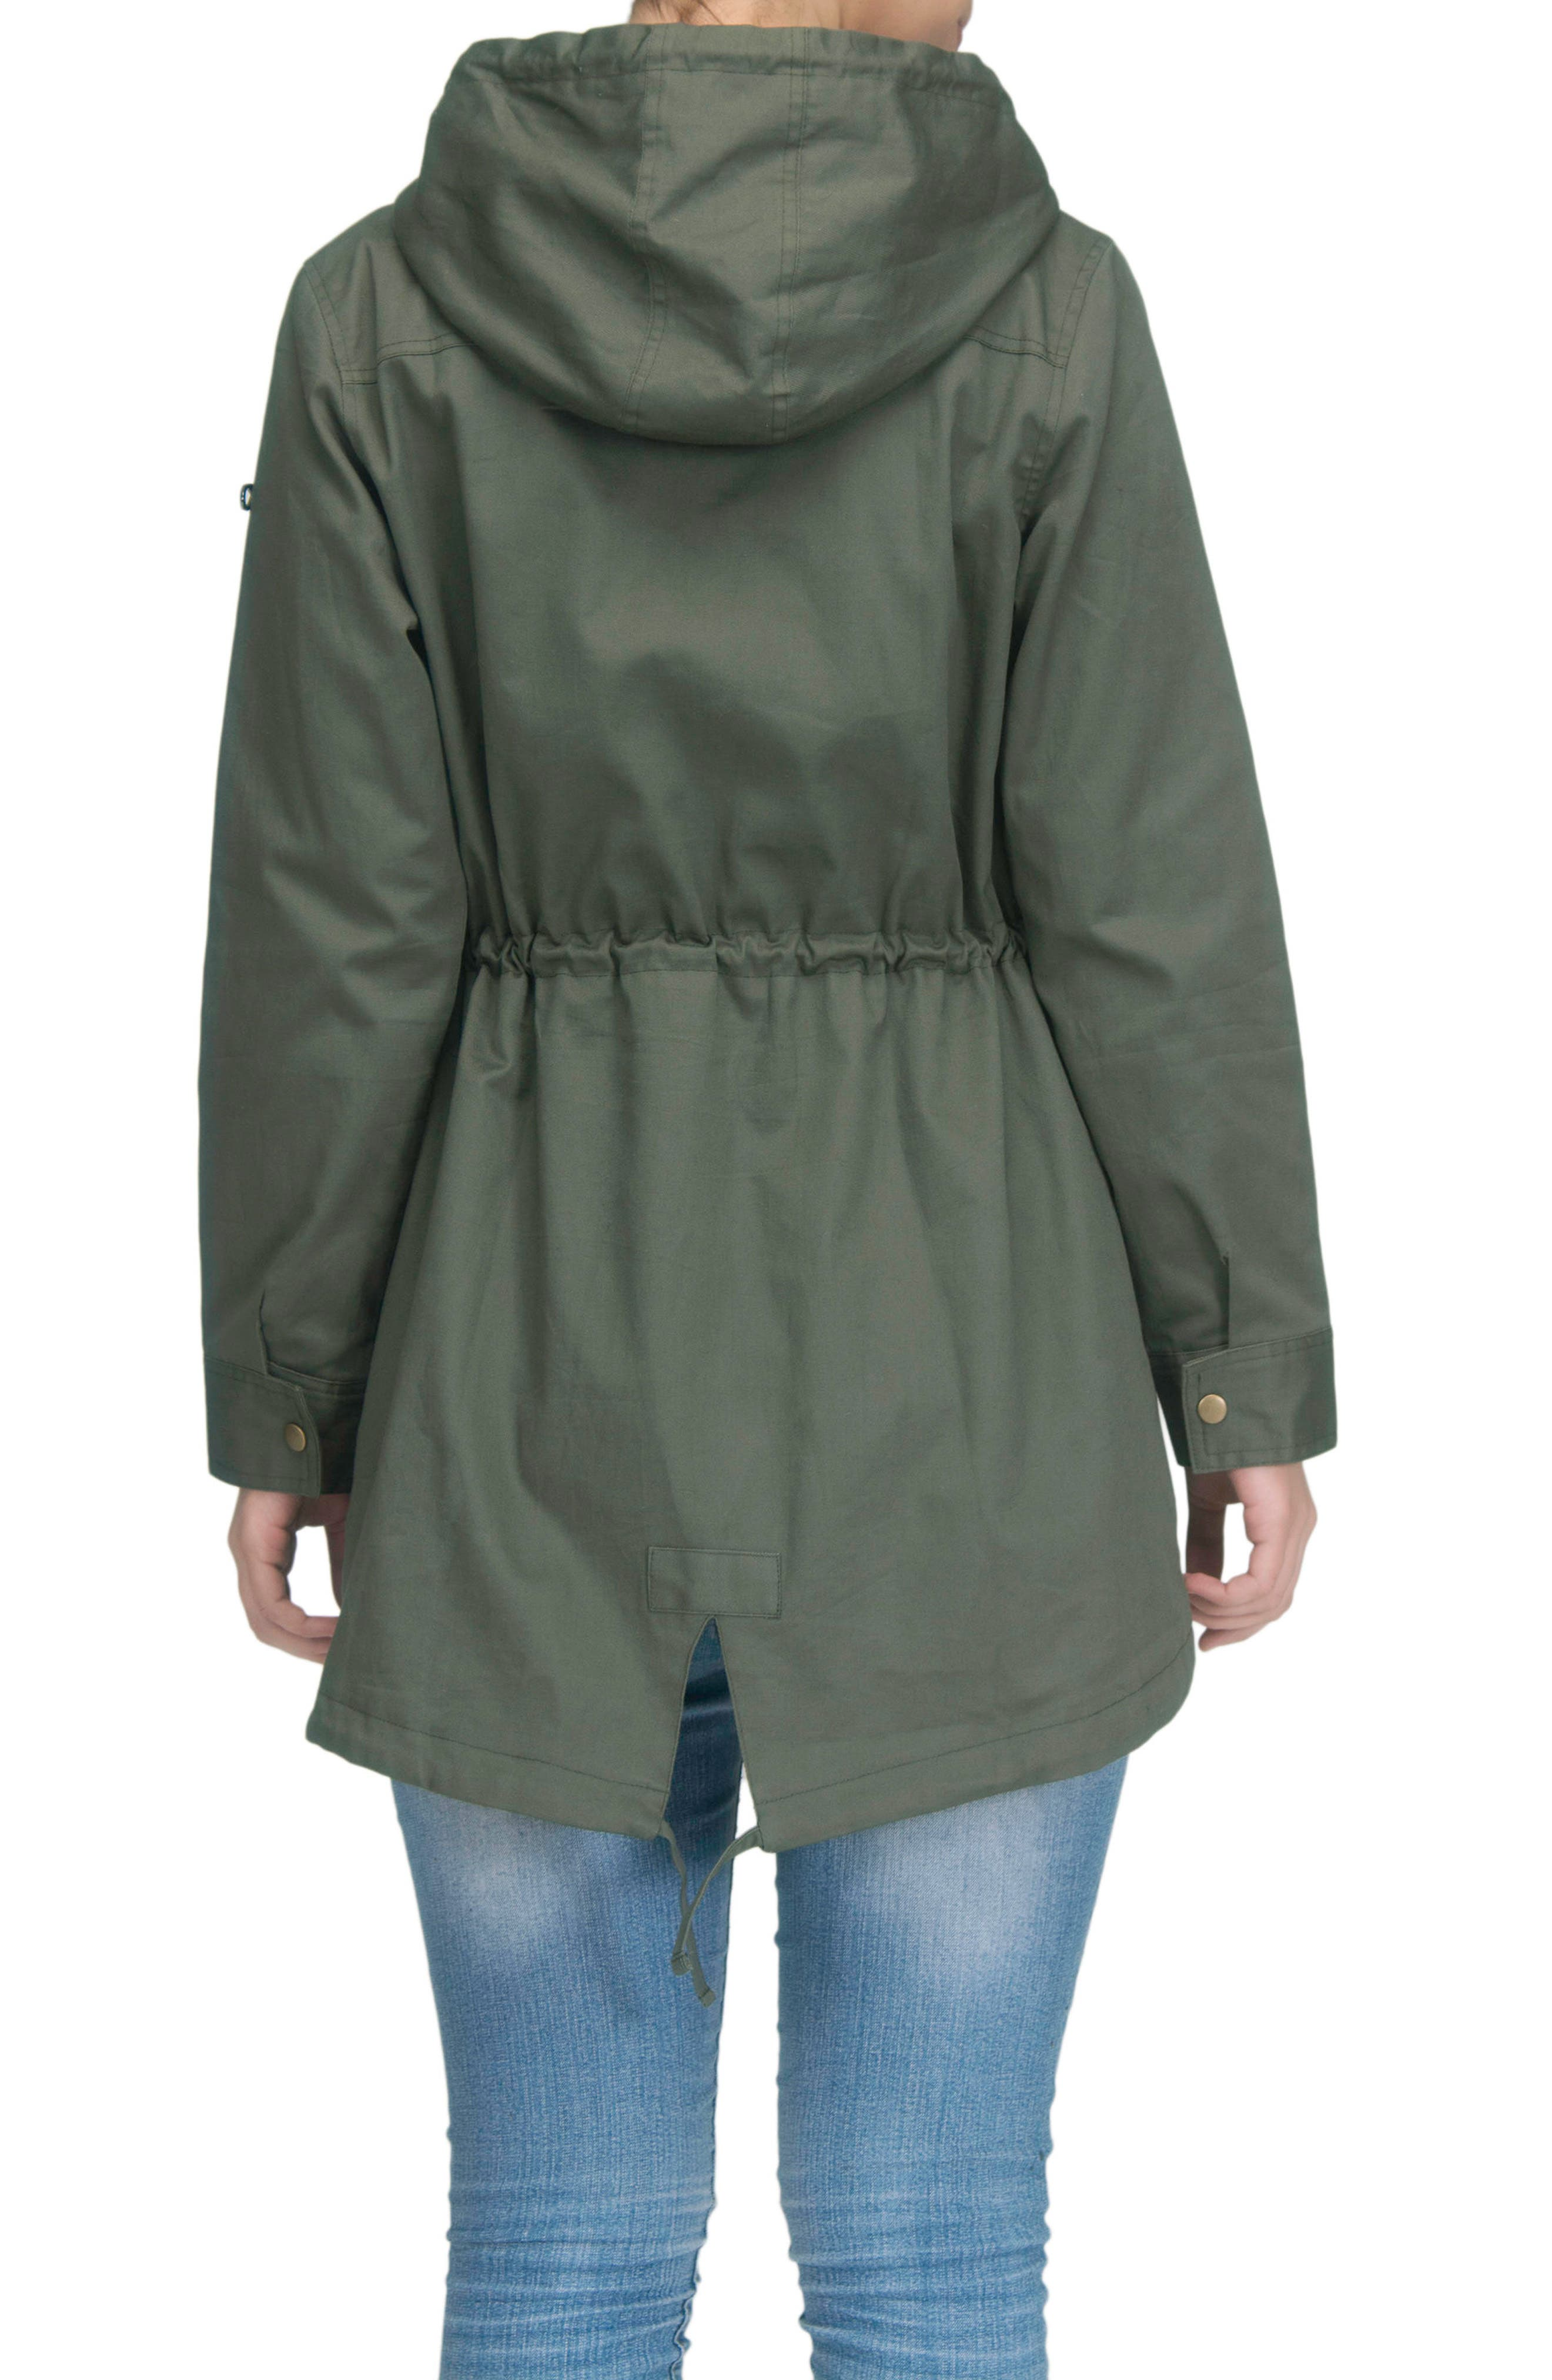 Convertible Military 3-in-1 Maternity/Nursing Jacket,                             Alternate thumbnail 4, color,                             KHAKI GREEN